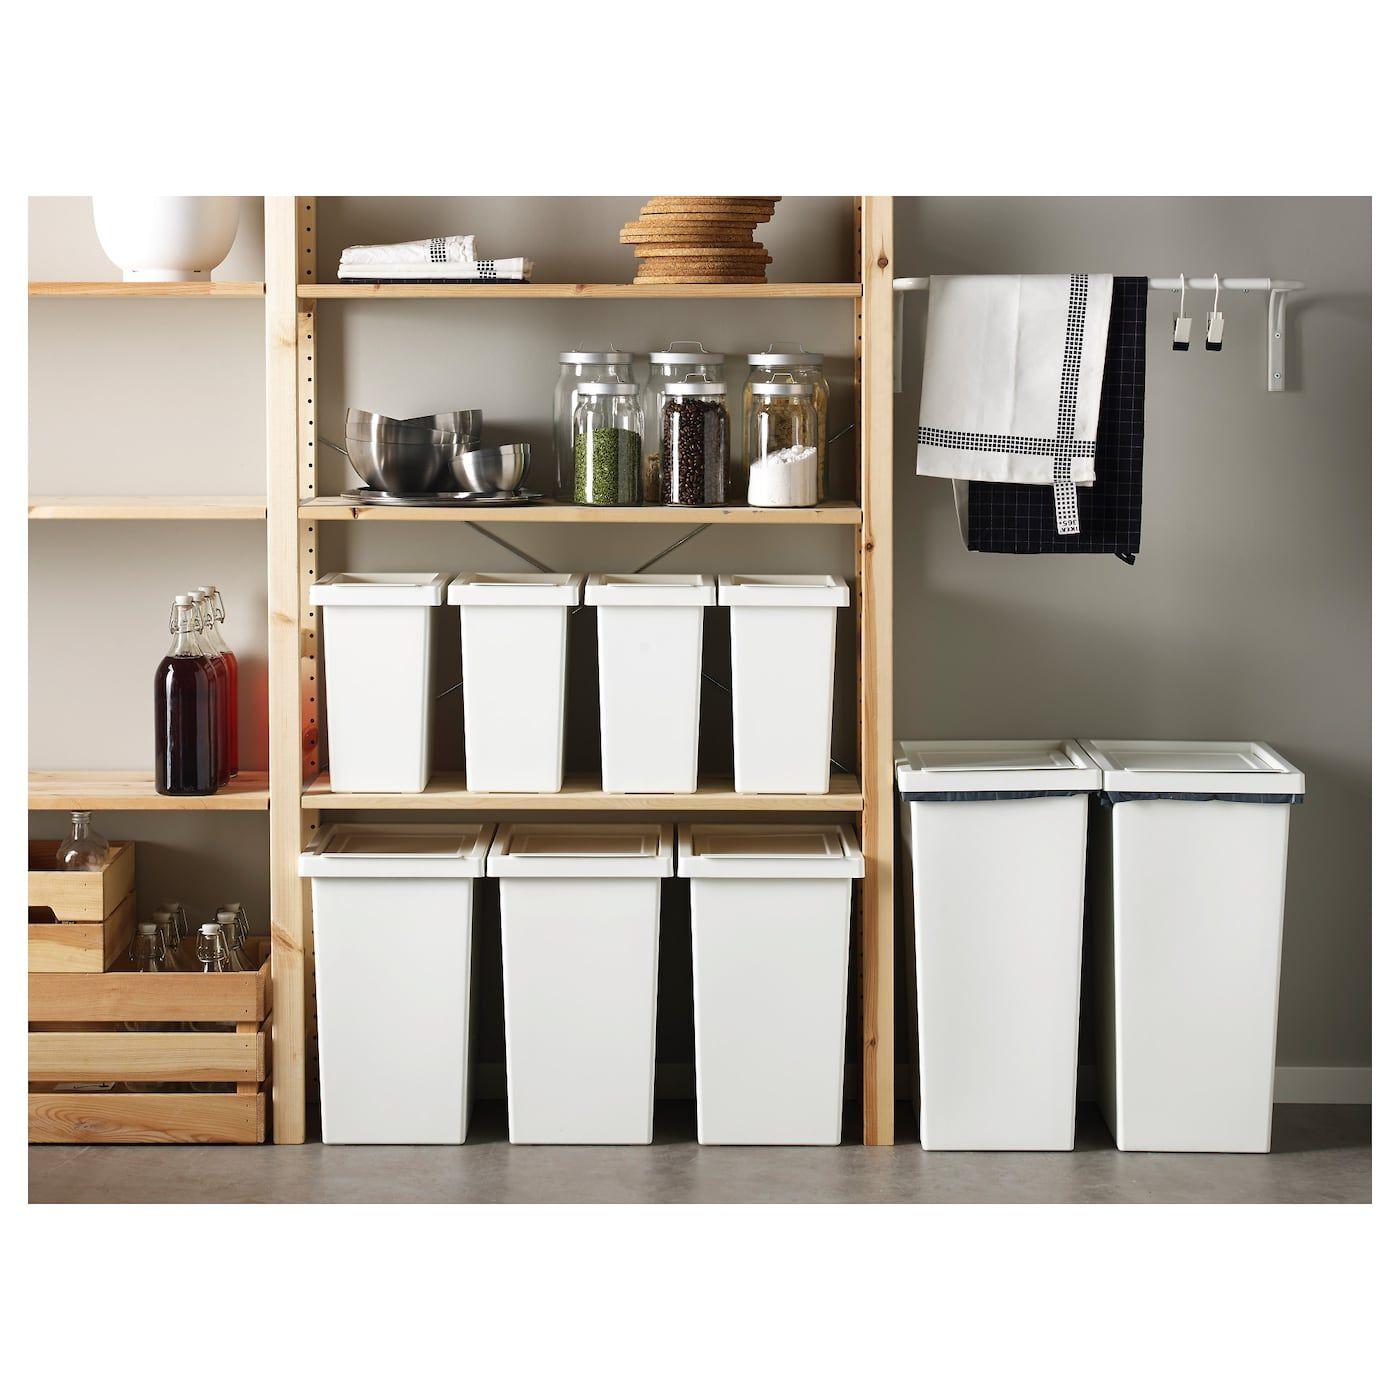 Filur Bin With Lid White Ikea Ikea Recycling Bins Kitchen Diy Pantry Organization